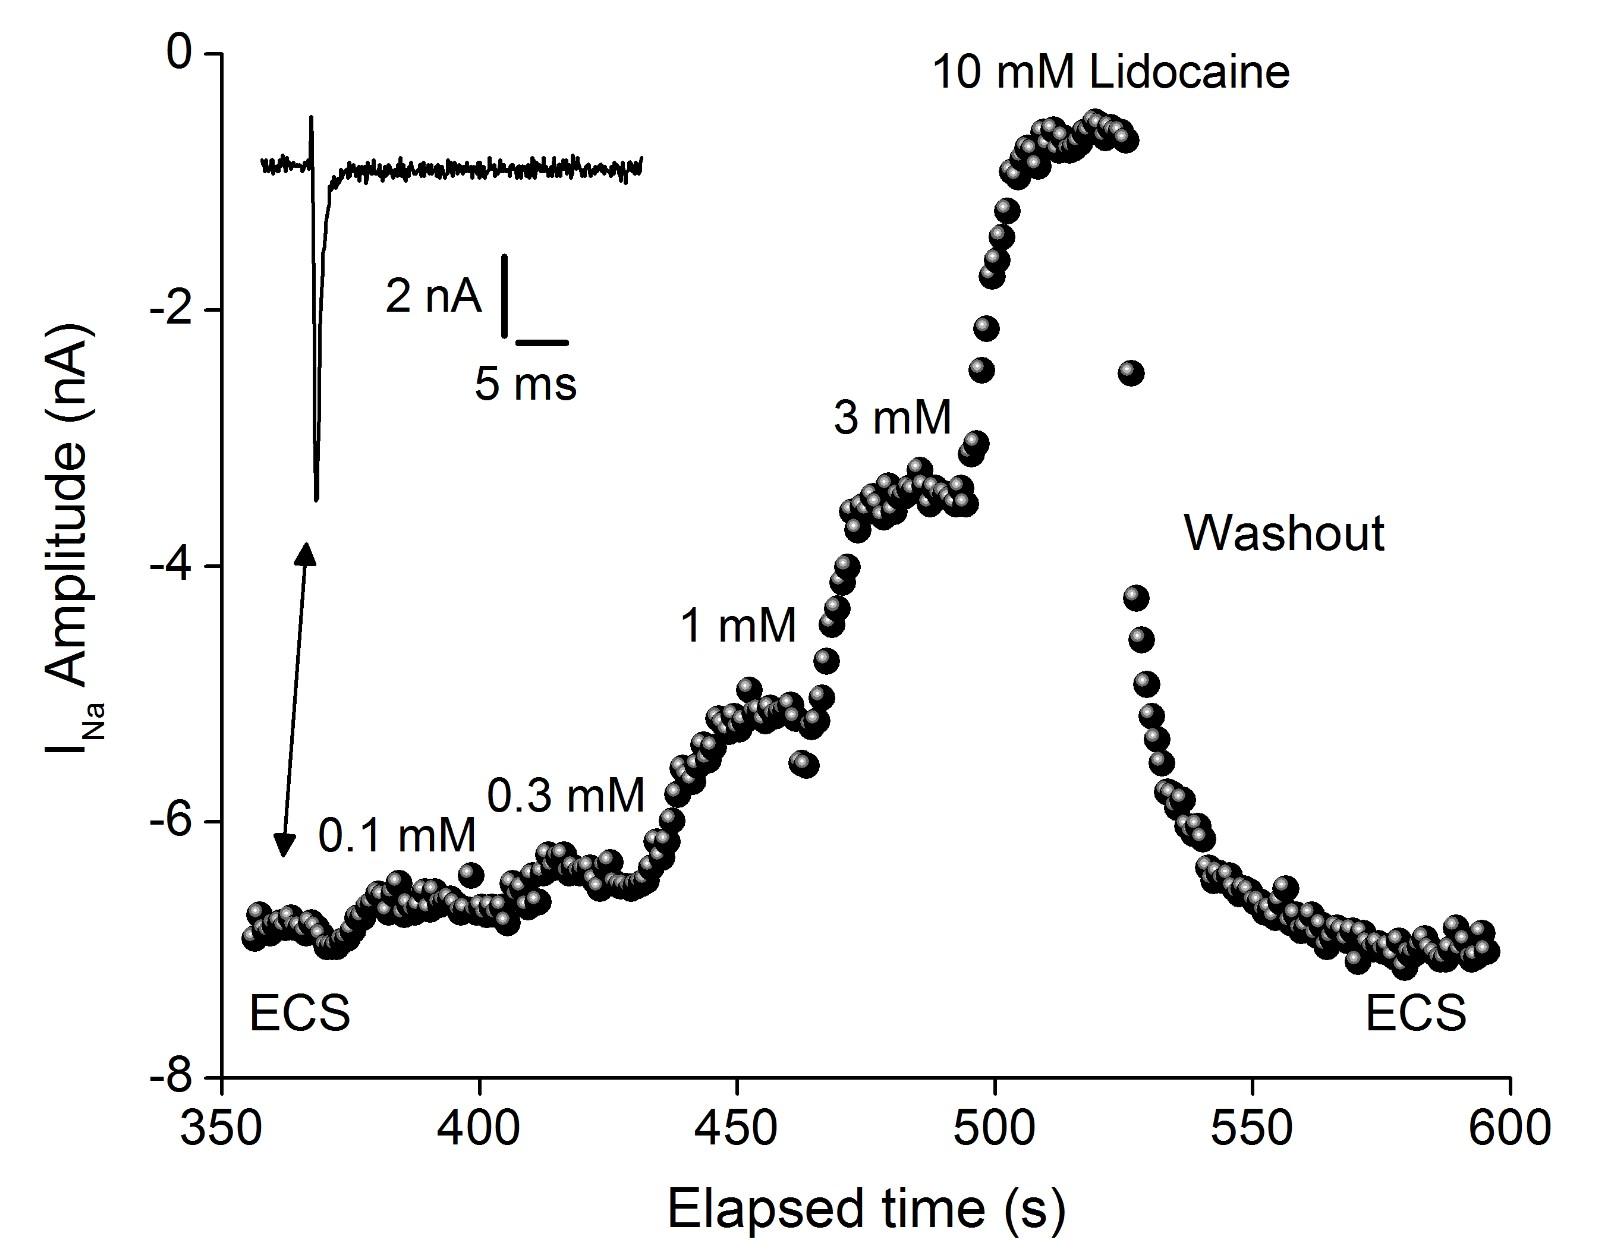 Nav 1.7 Lidocaine dose resonse